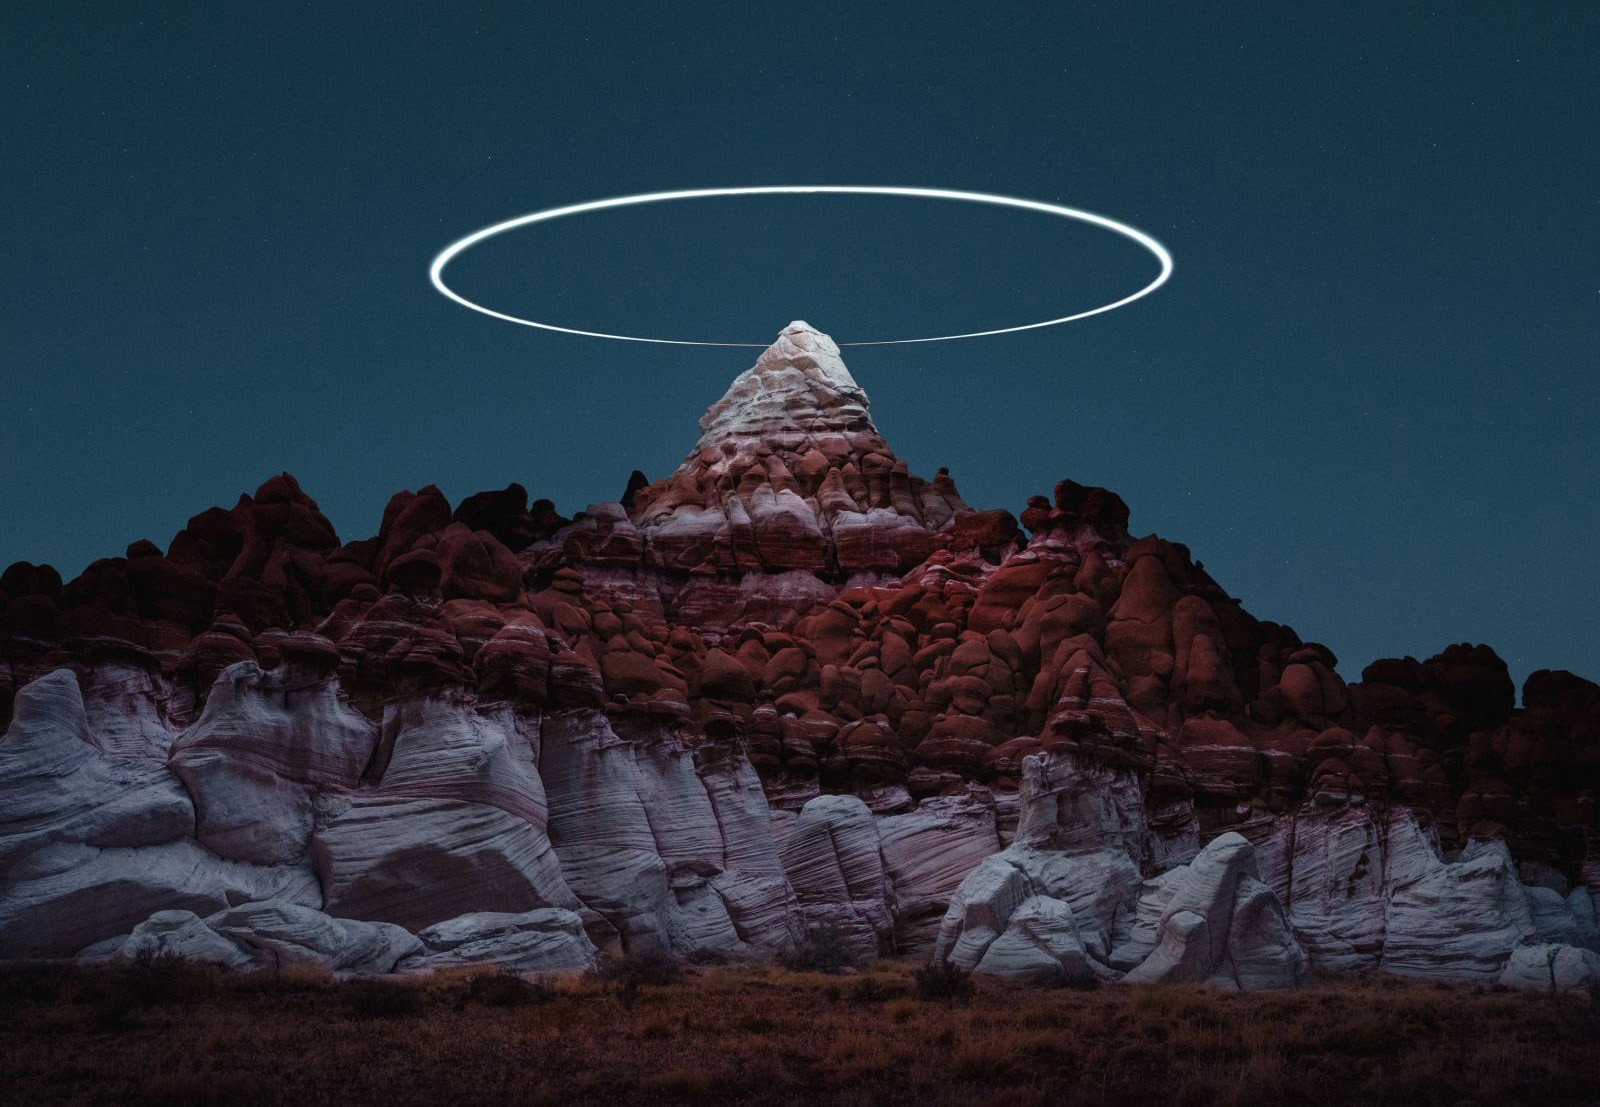 'Lux Noctis' by Reuben Wu.